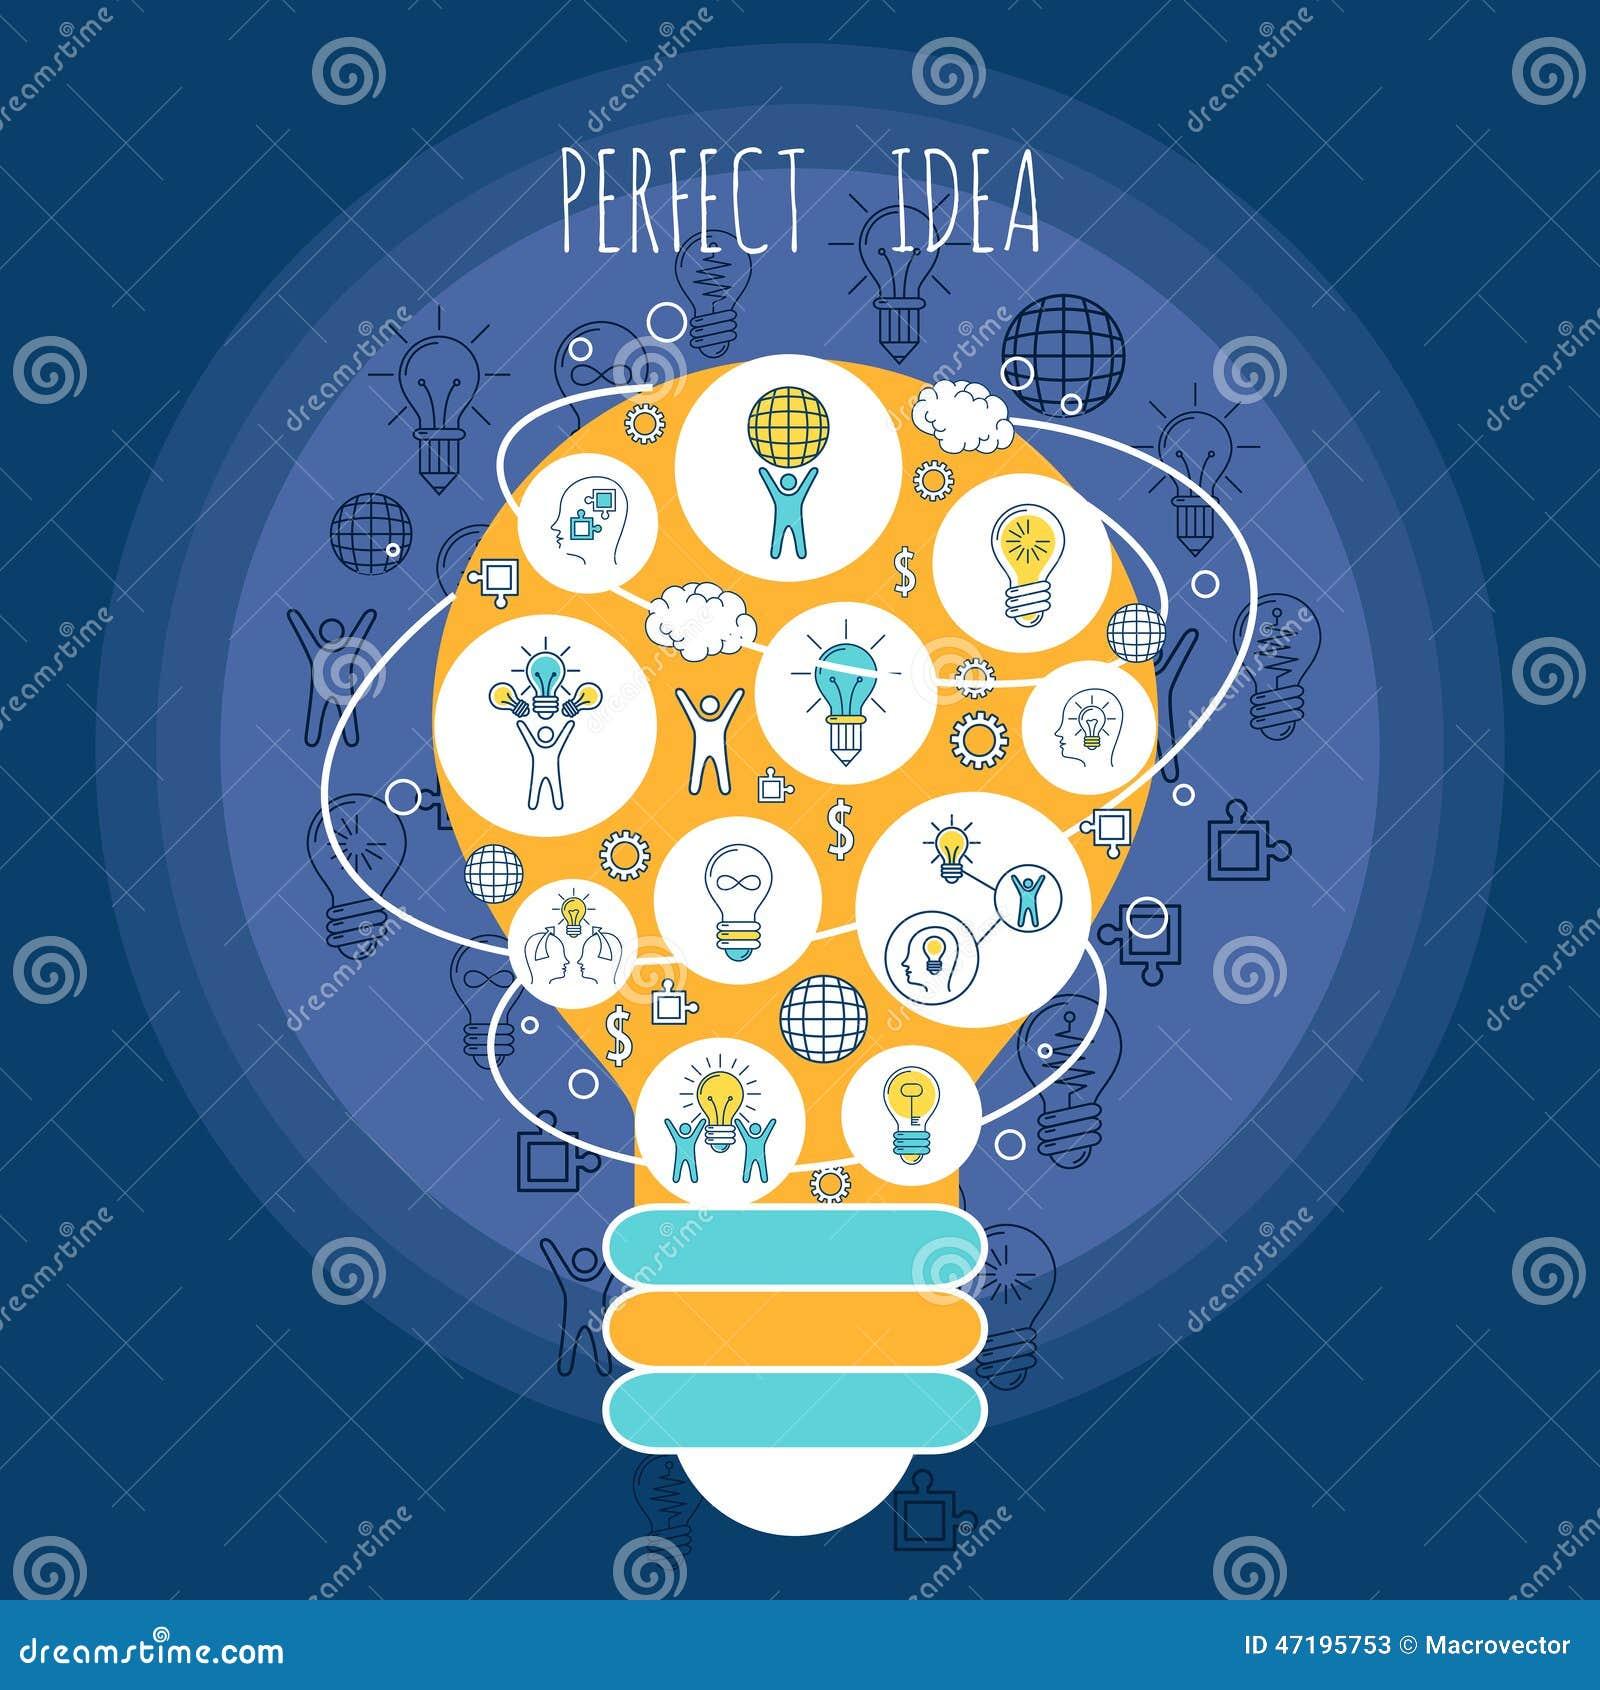 Perfect Idea Poster Stock Vector